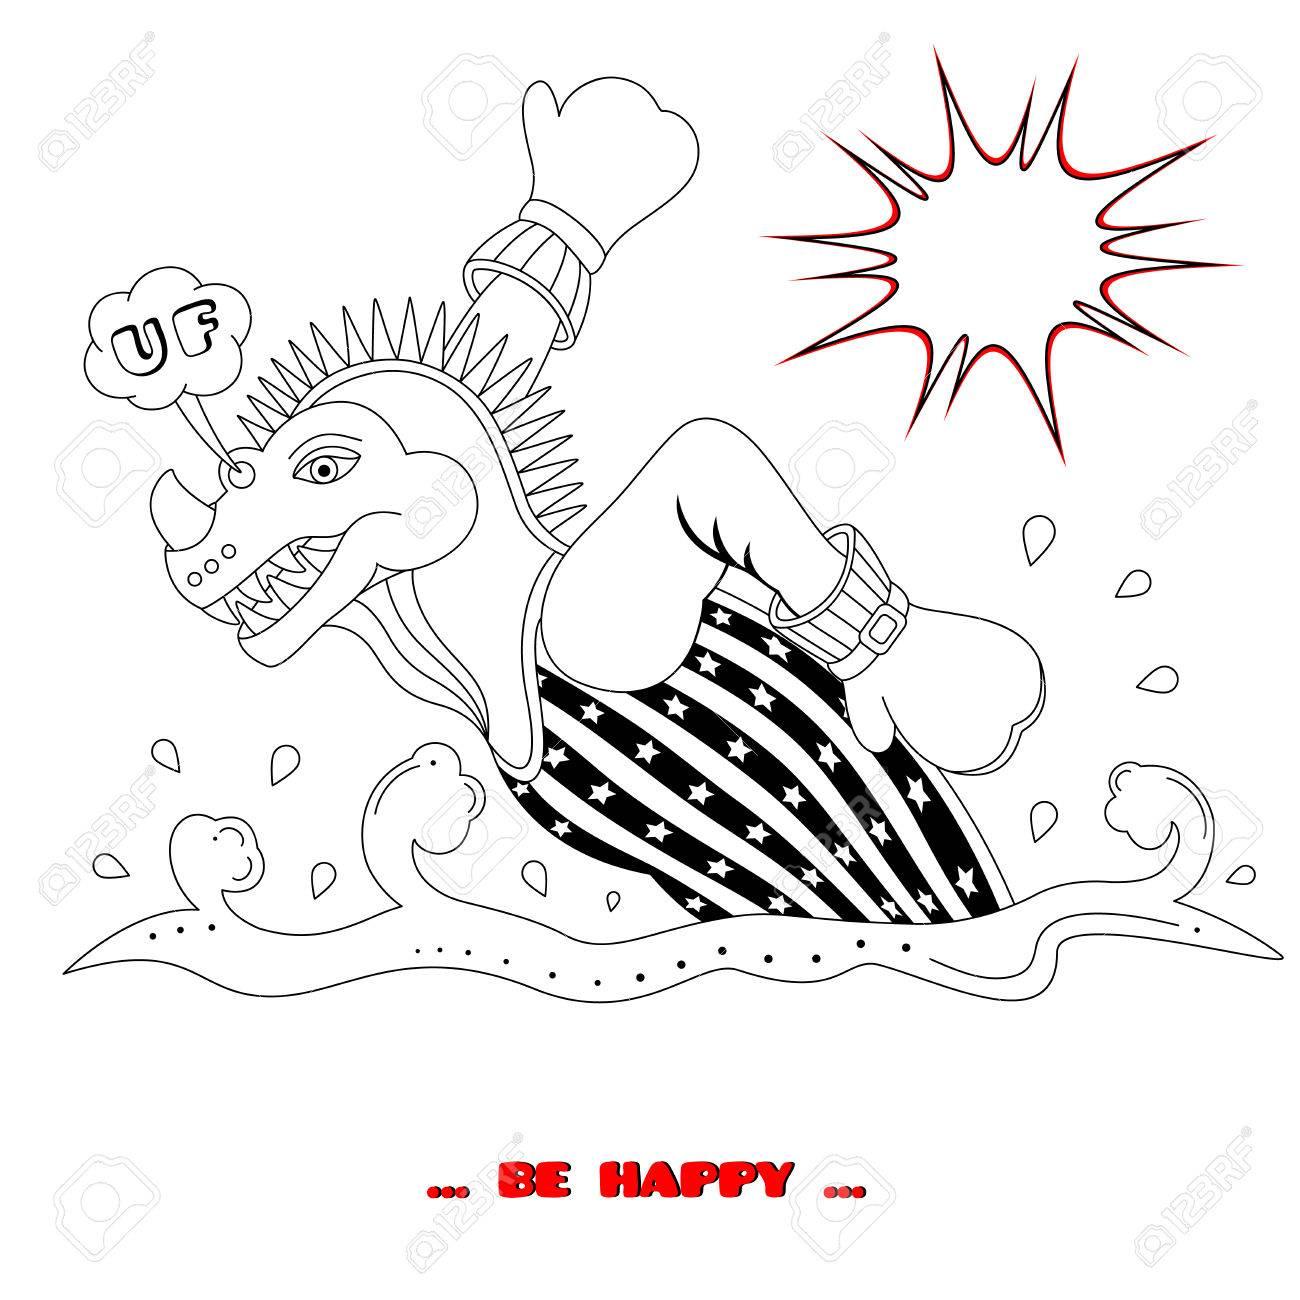 Dino on the run. Coloring book. Cartoon style. Vector illustration. - 83332644